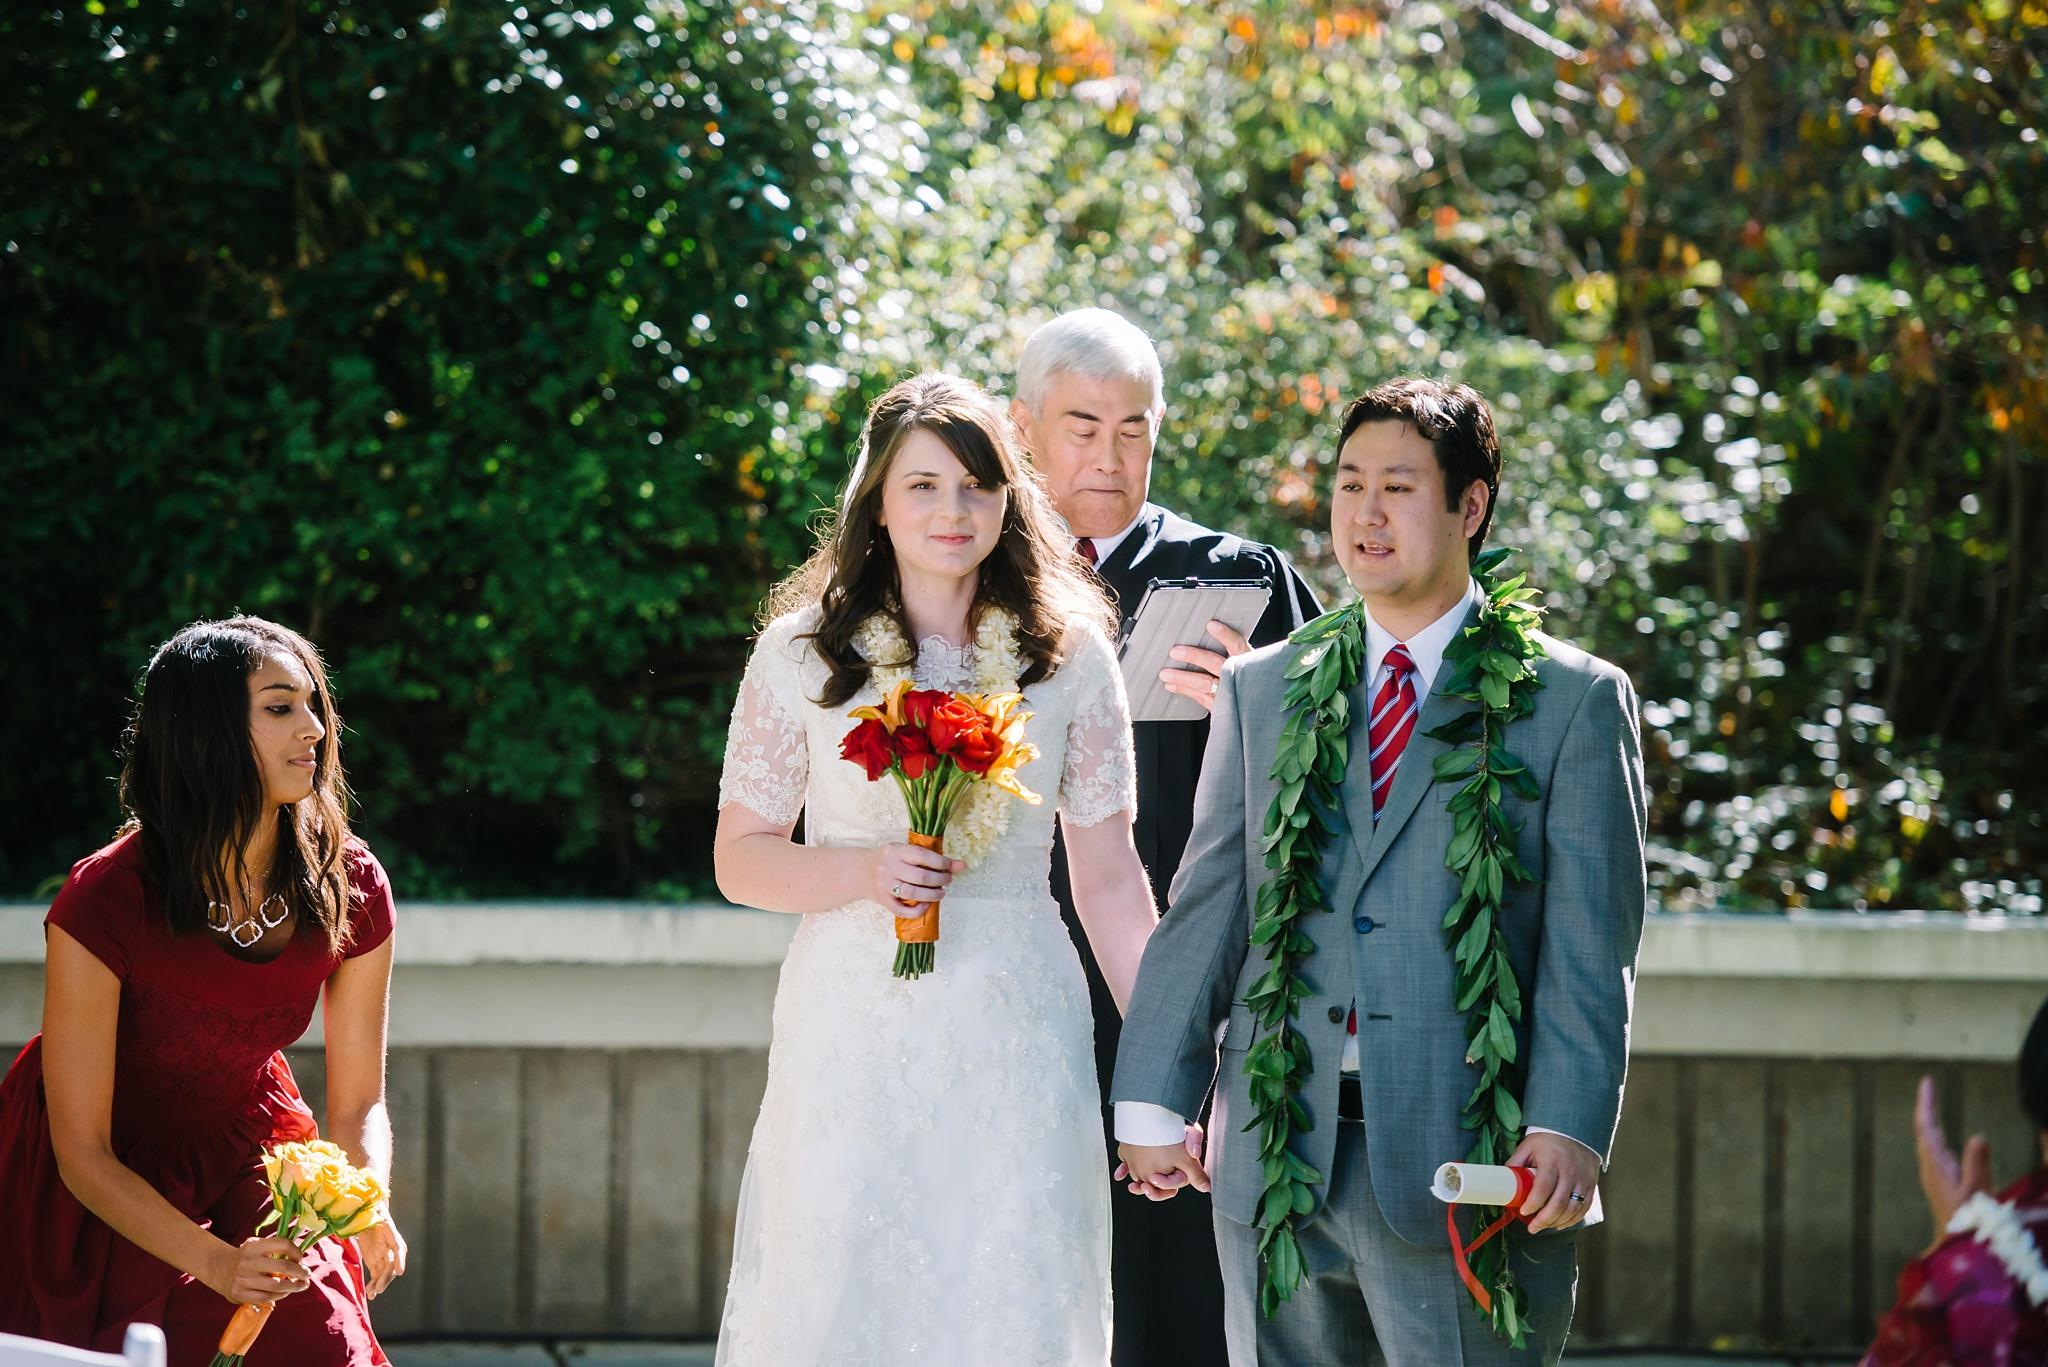 Park City Wedding Photographer Ali Sumsion 046